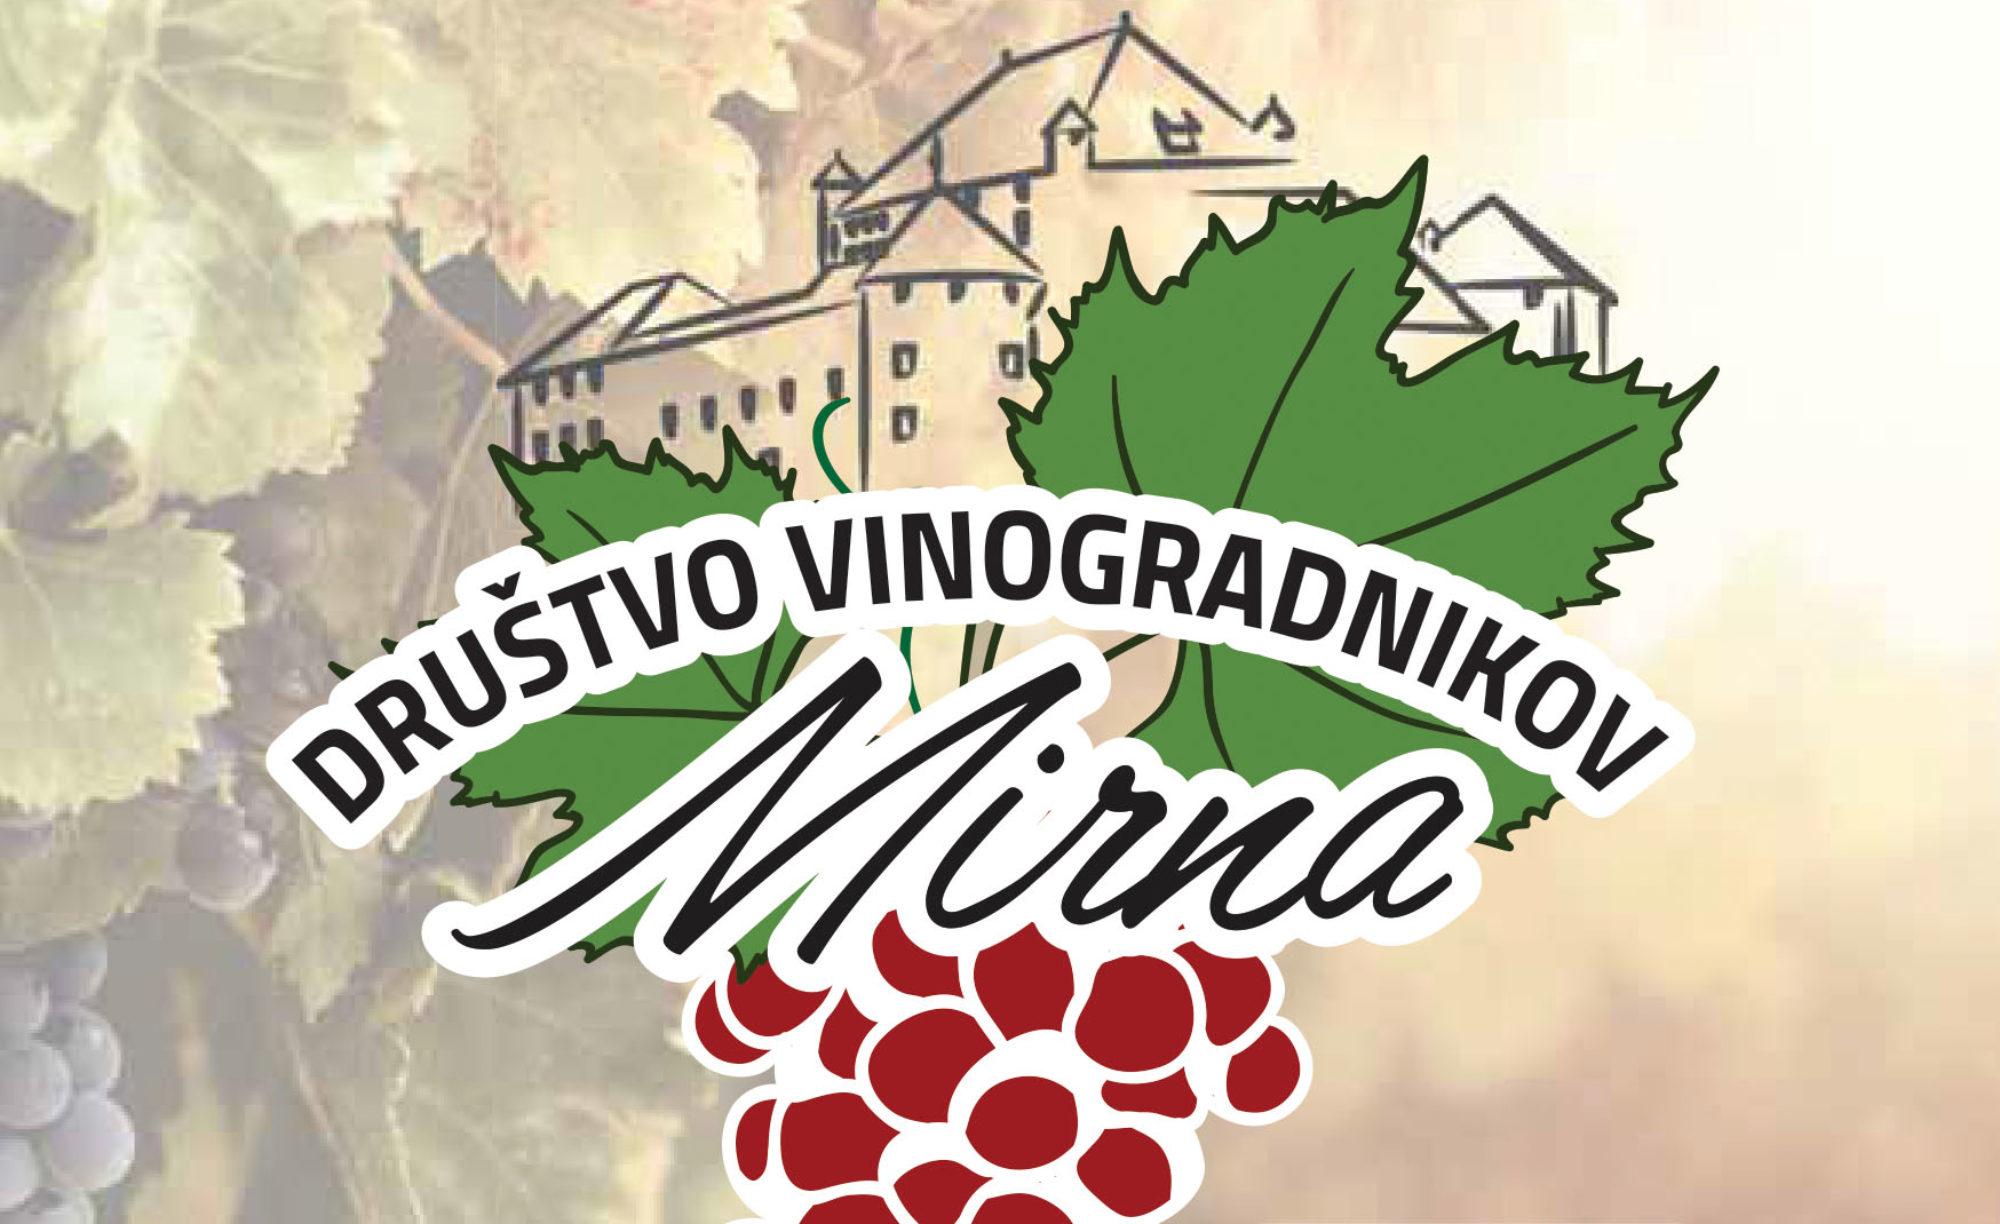 Društvo vinogradnikov Mirna